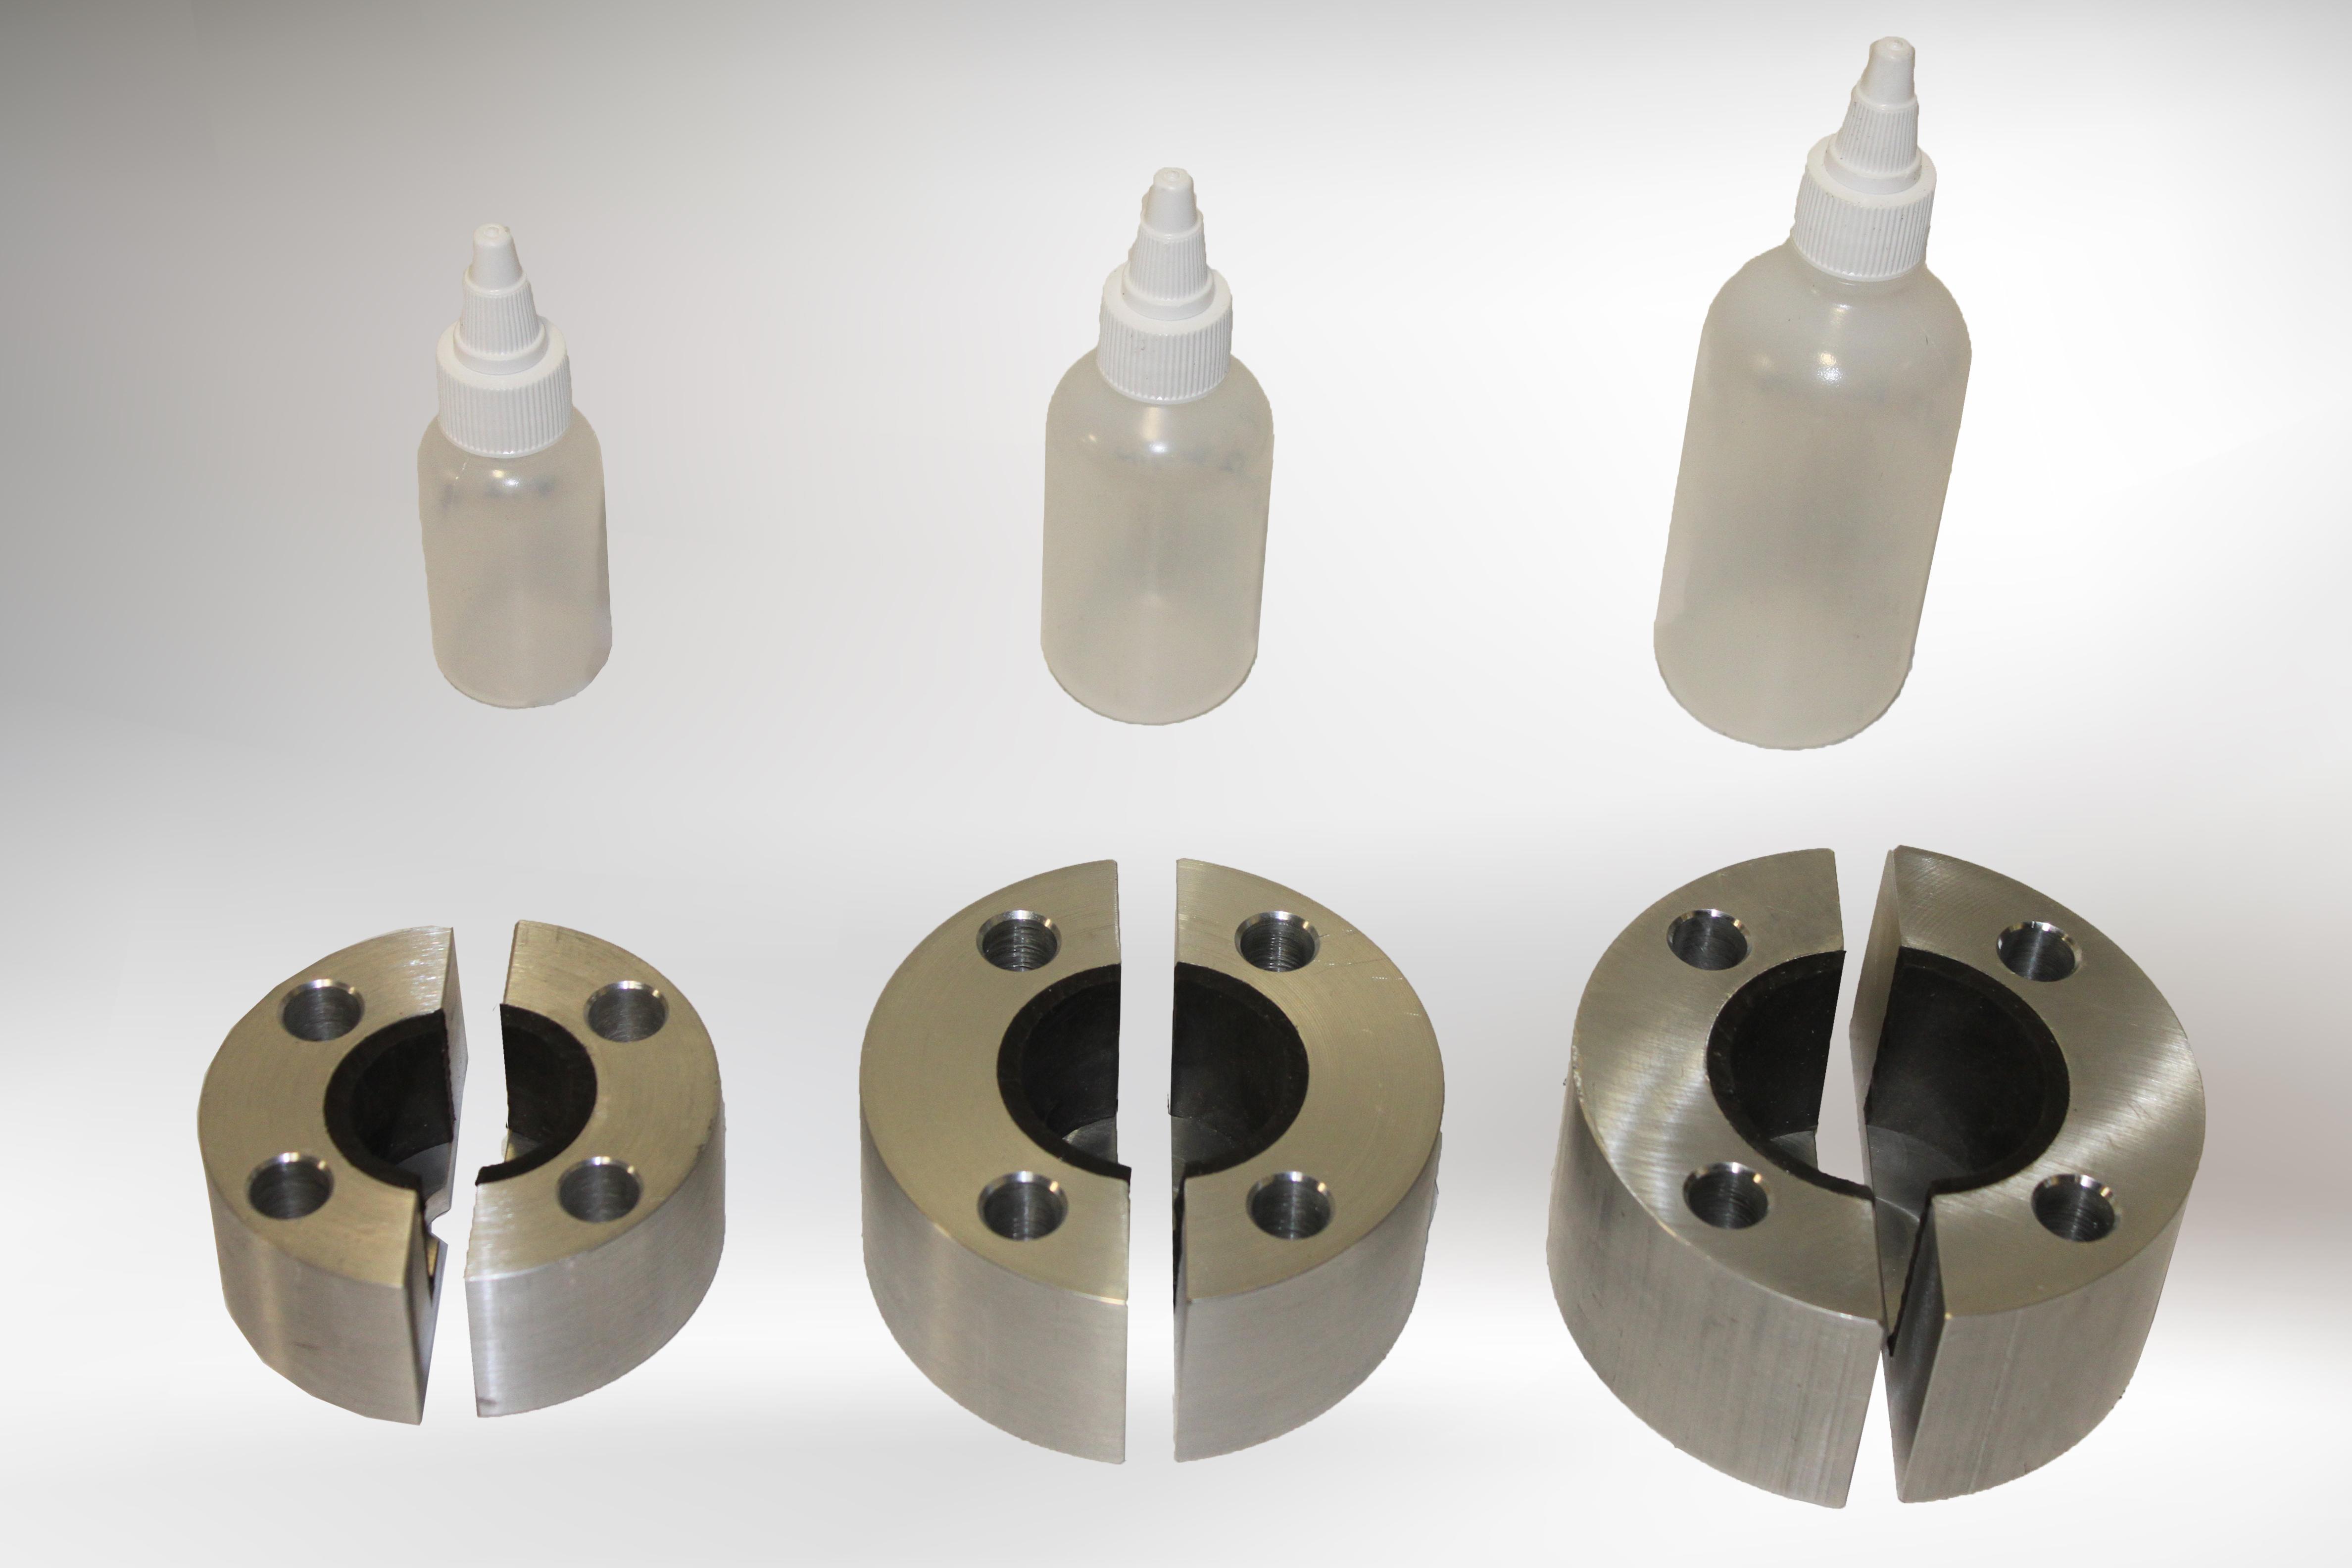 Torque Tester Accessories - custom Brackets